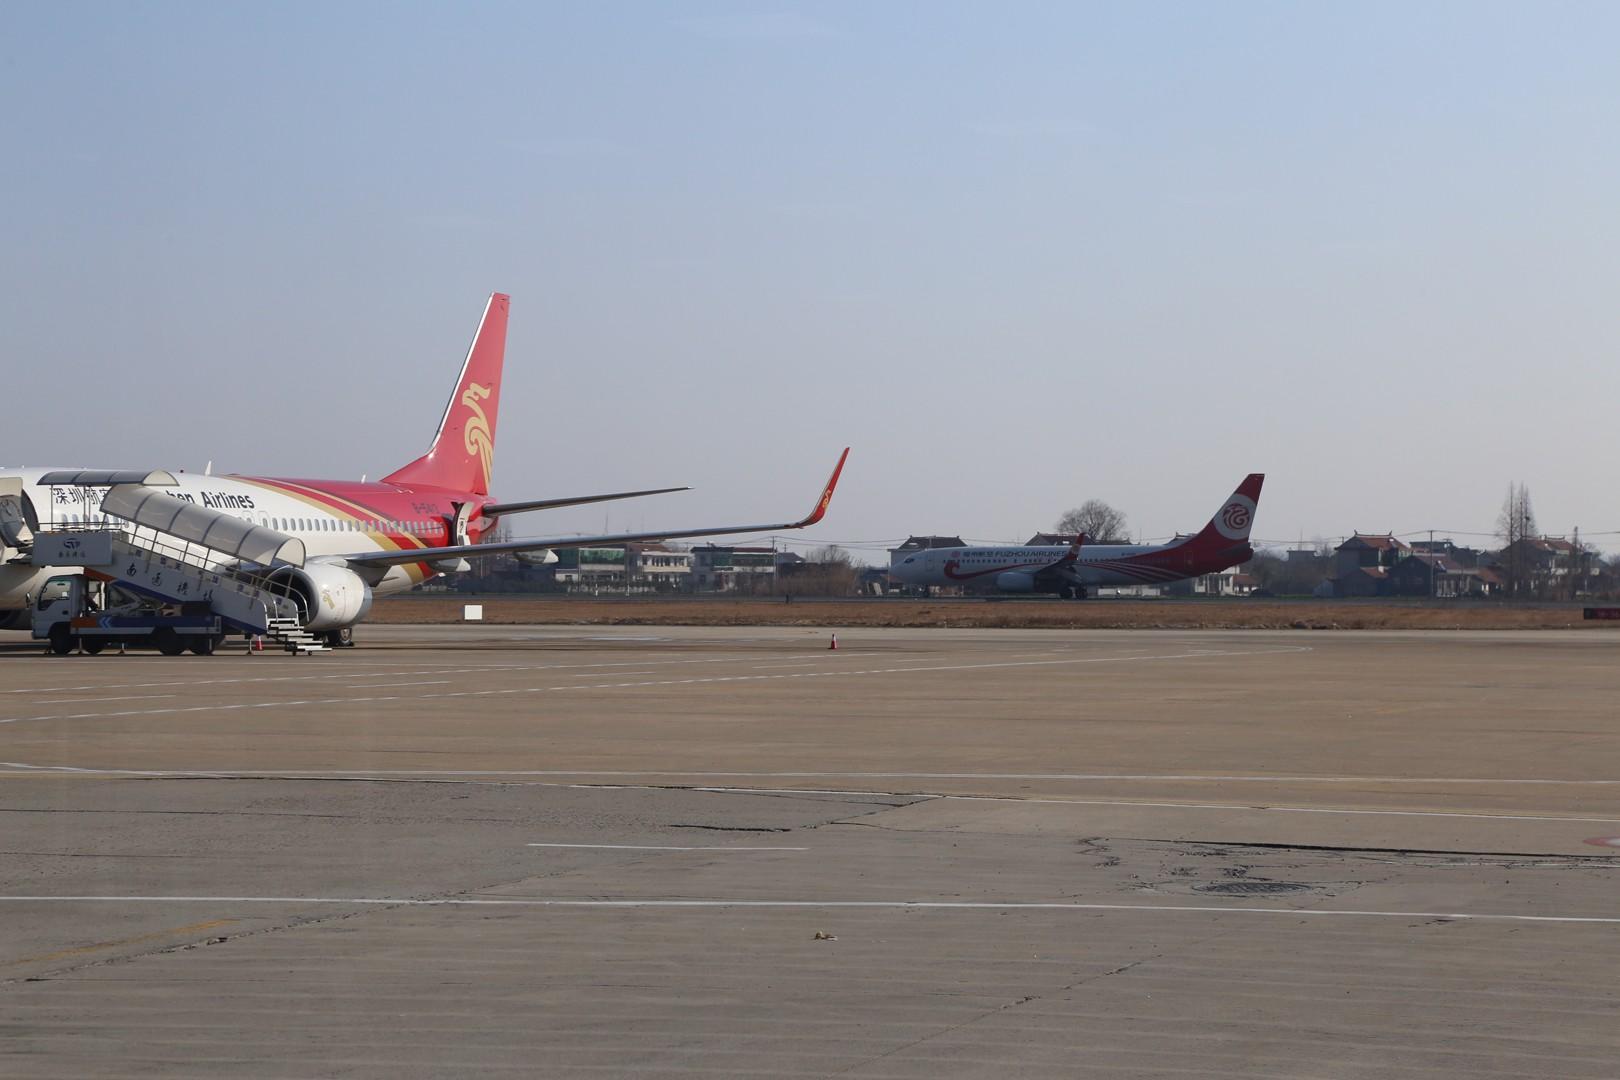 Re:[原创]白云之城——广州行记(南通兴东ZSNT/NTG—广州白云ZGGG/CAN—上海虹桥ZSSS/SHA) BOEING 737-800 B-1559 中国南通兴东机场